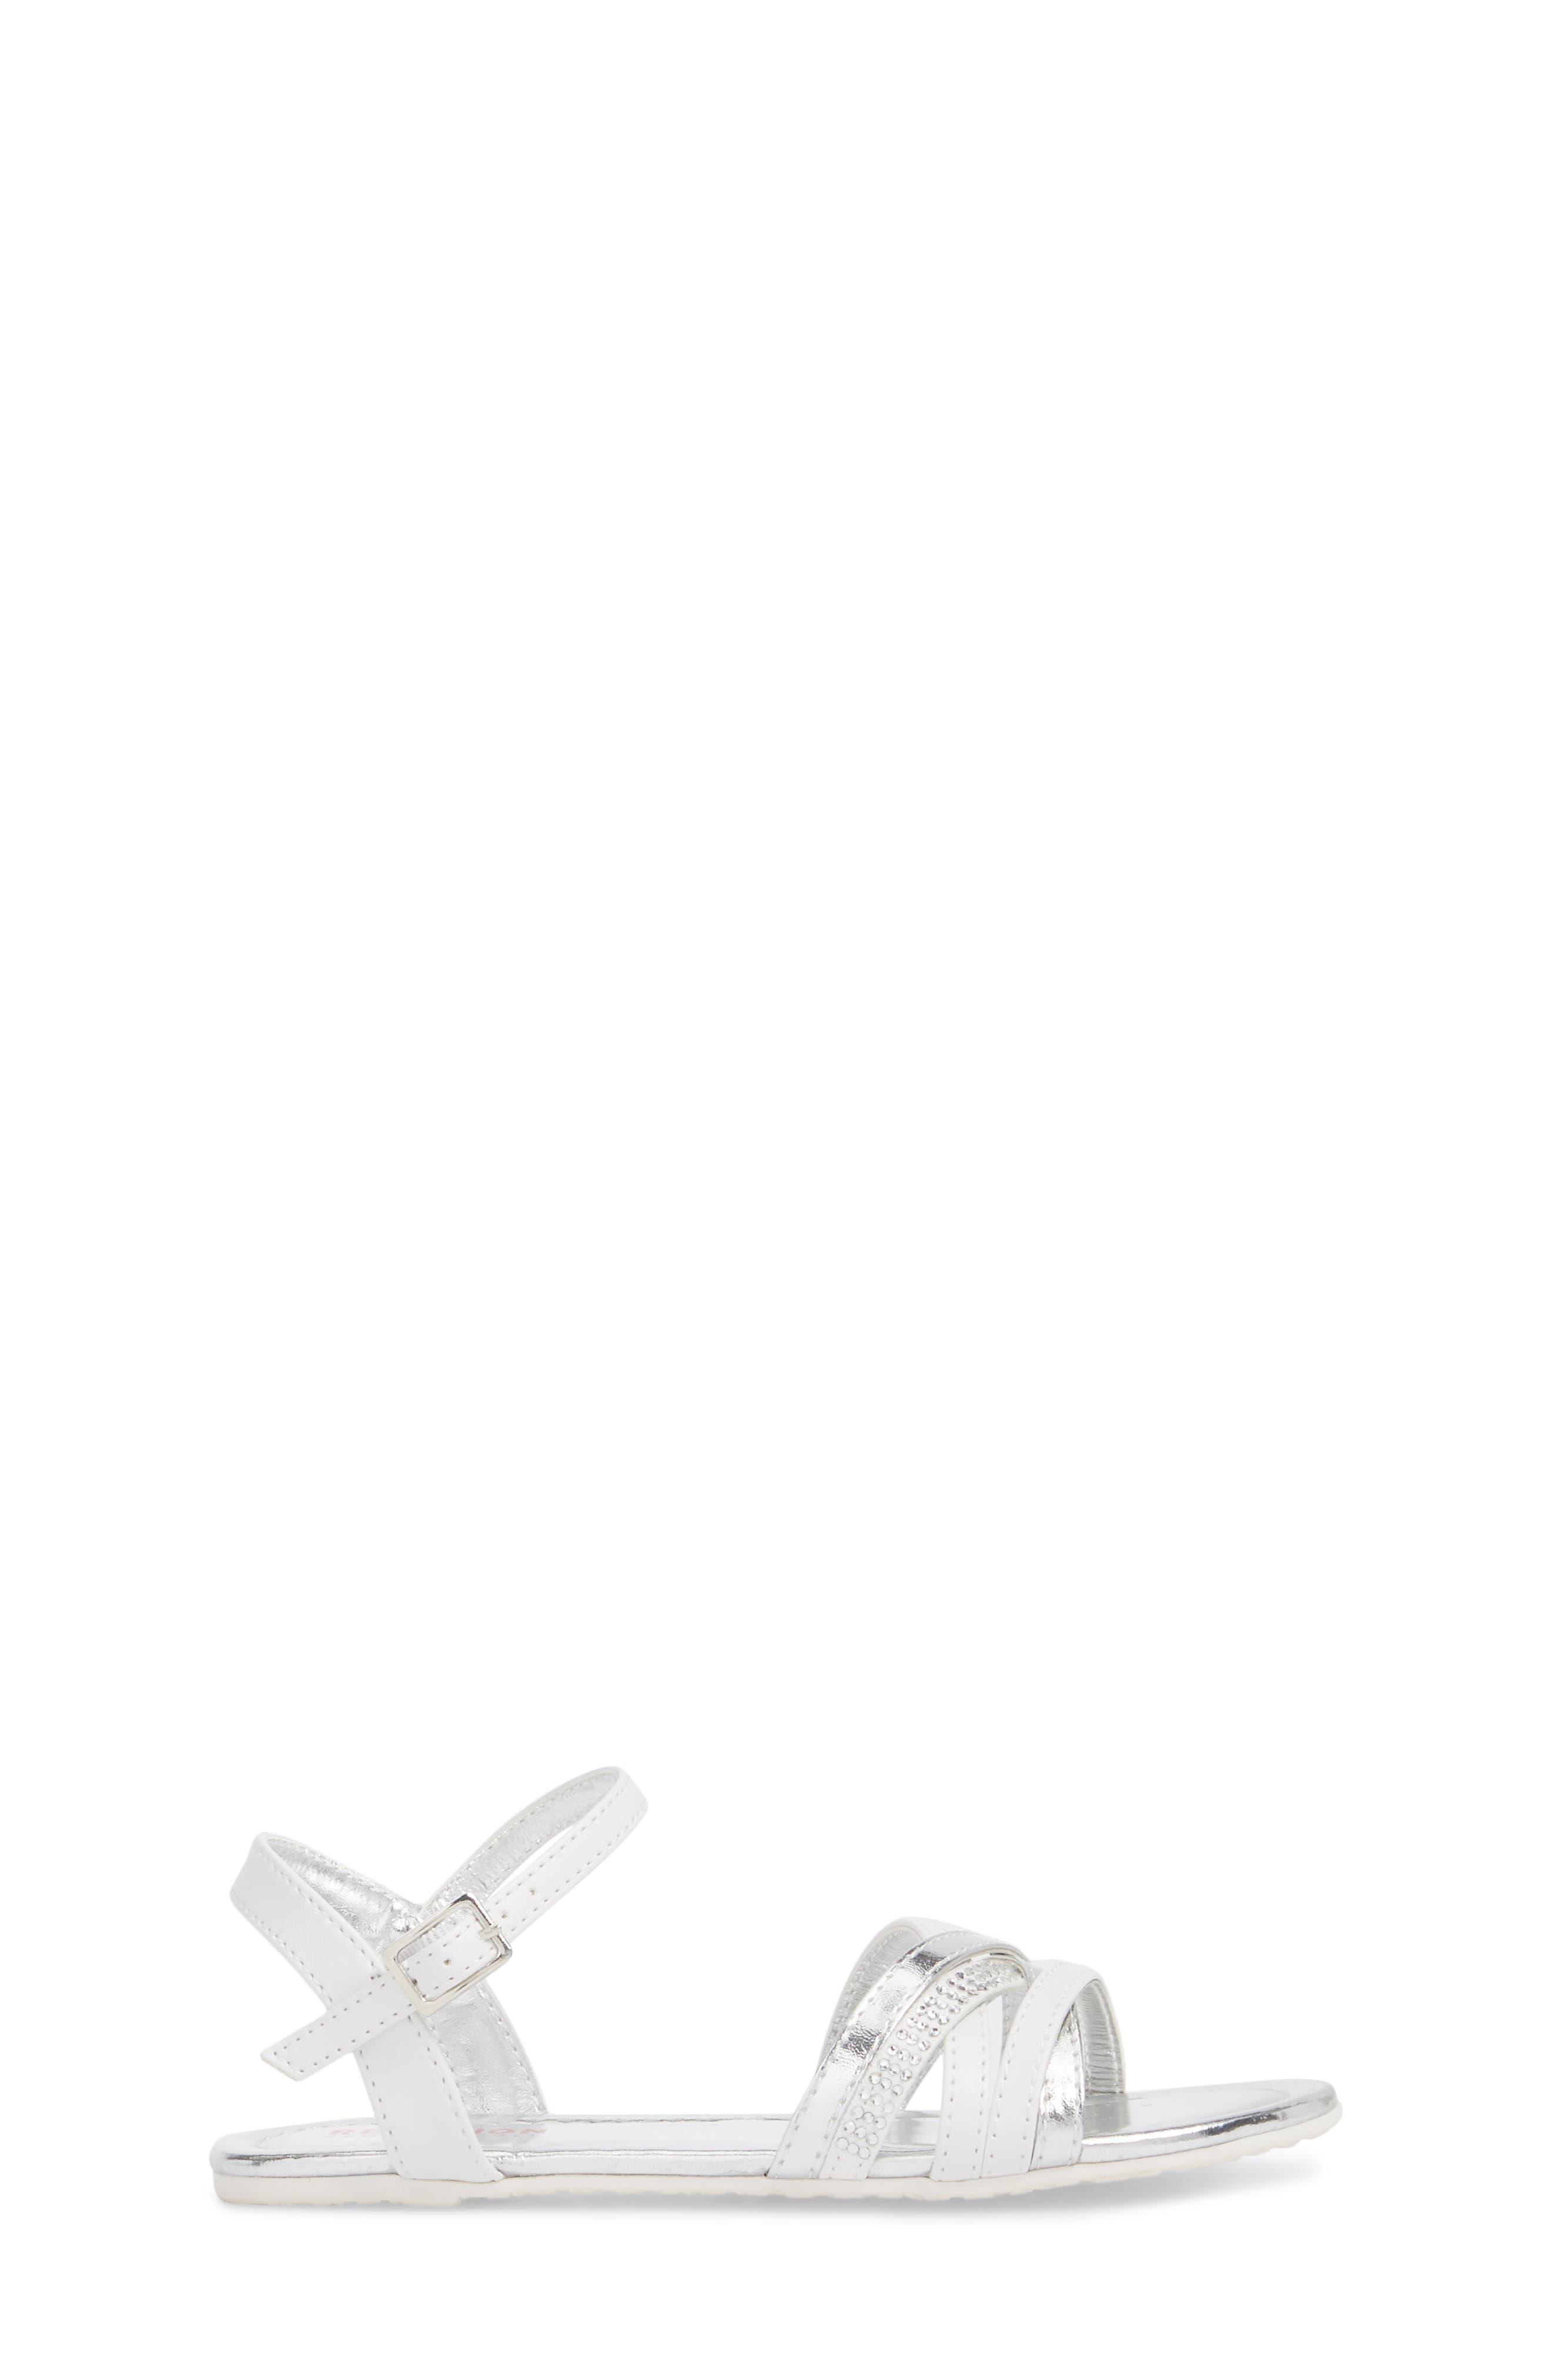 Kiera Getty Crystal Sandal,                             Alternate thumbnail 3, color,                             White